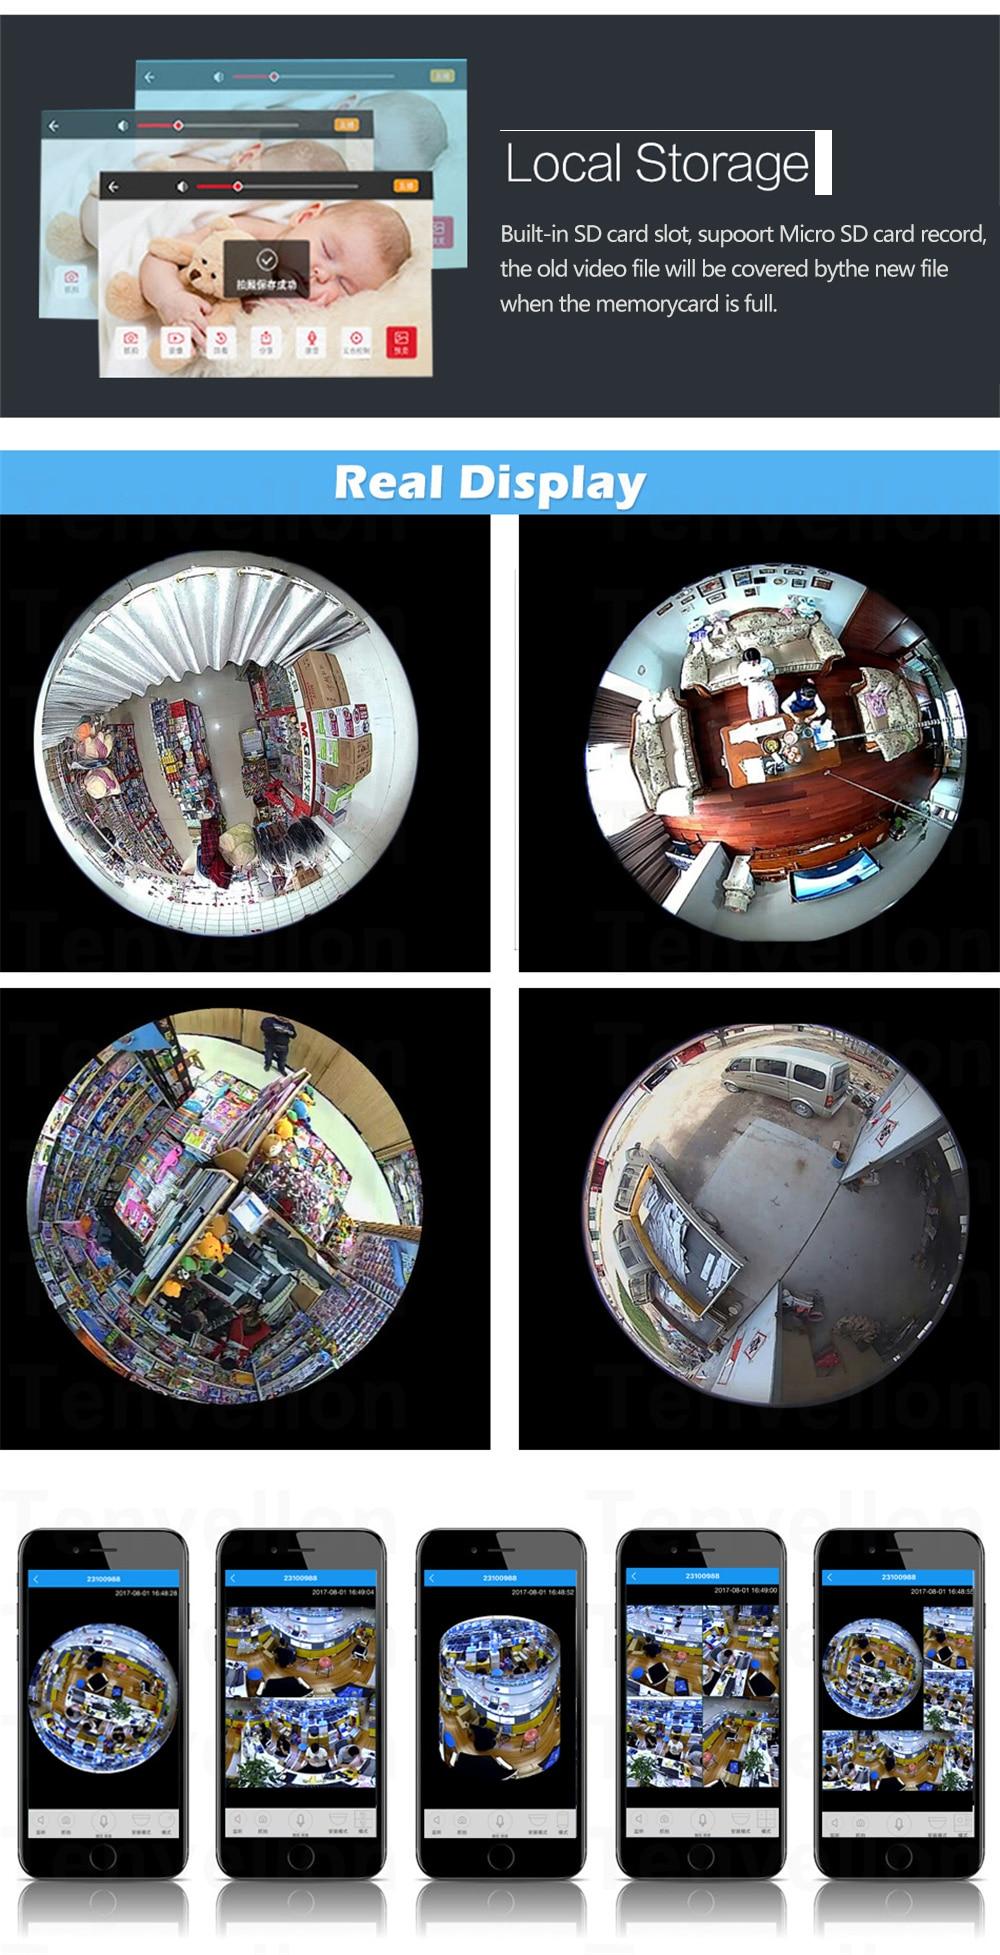 Wistino CCTV HD 960P WIFI IP Camera Alarm Wireless VR Panoramic Camera Fisheye 360 Degree Video Baby Monitor Home Surveillance (12)